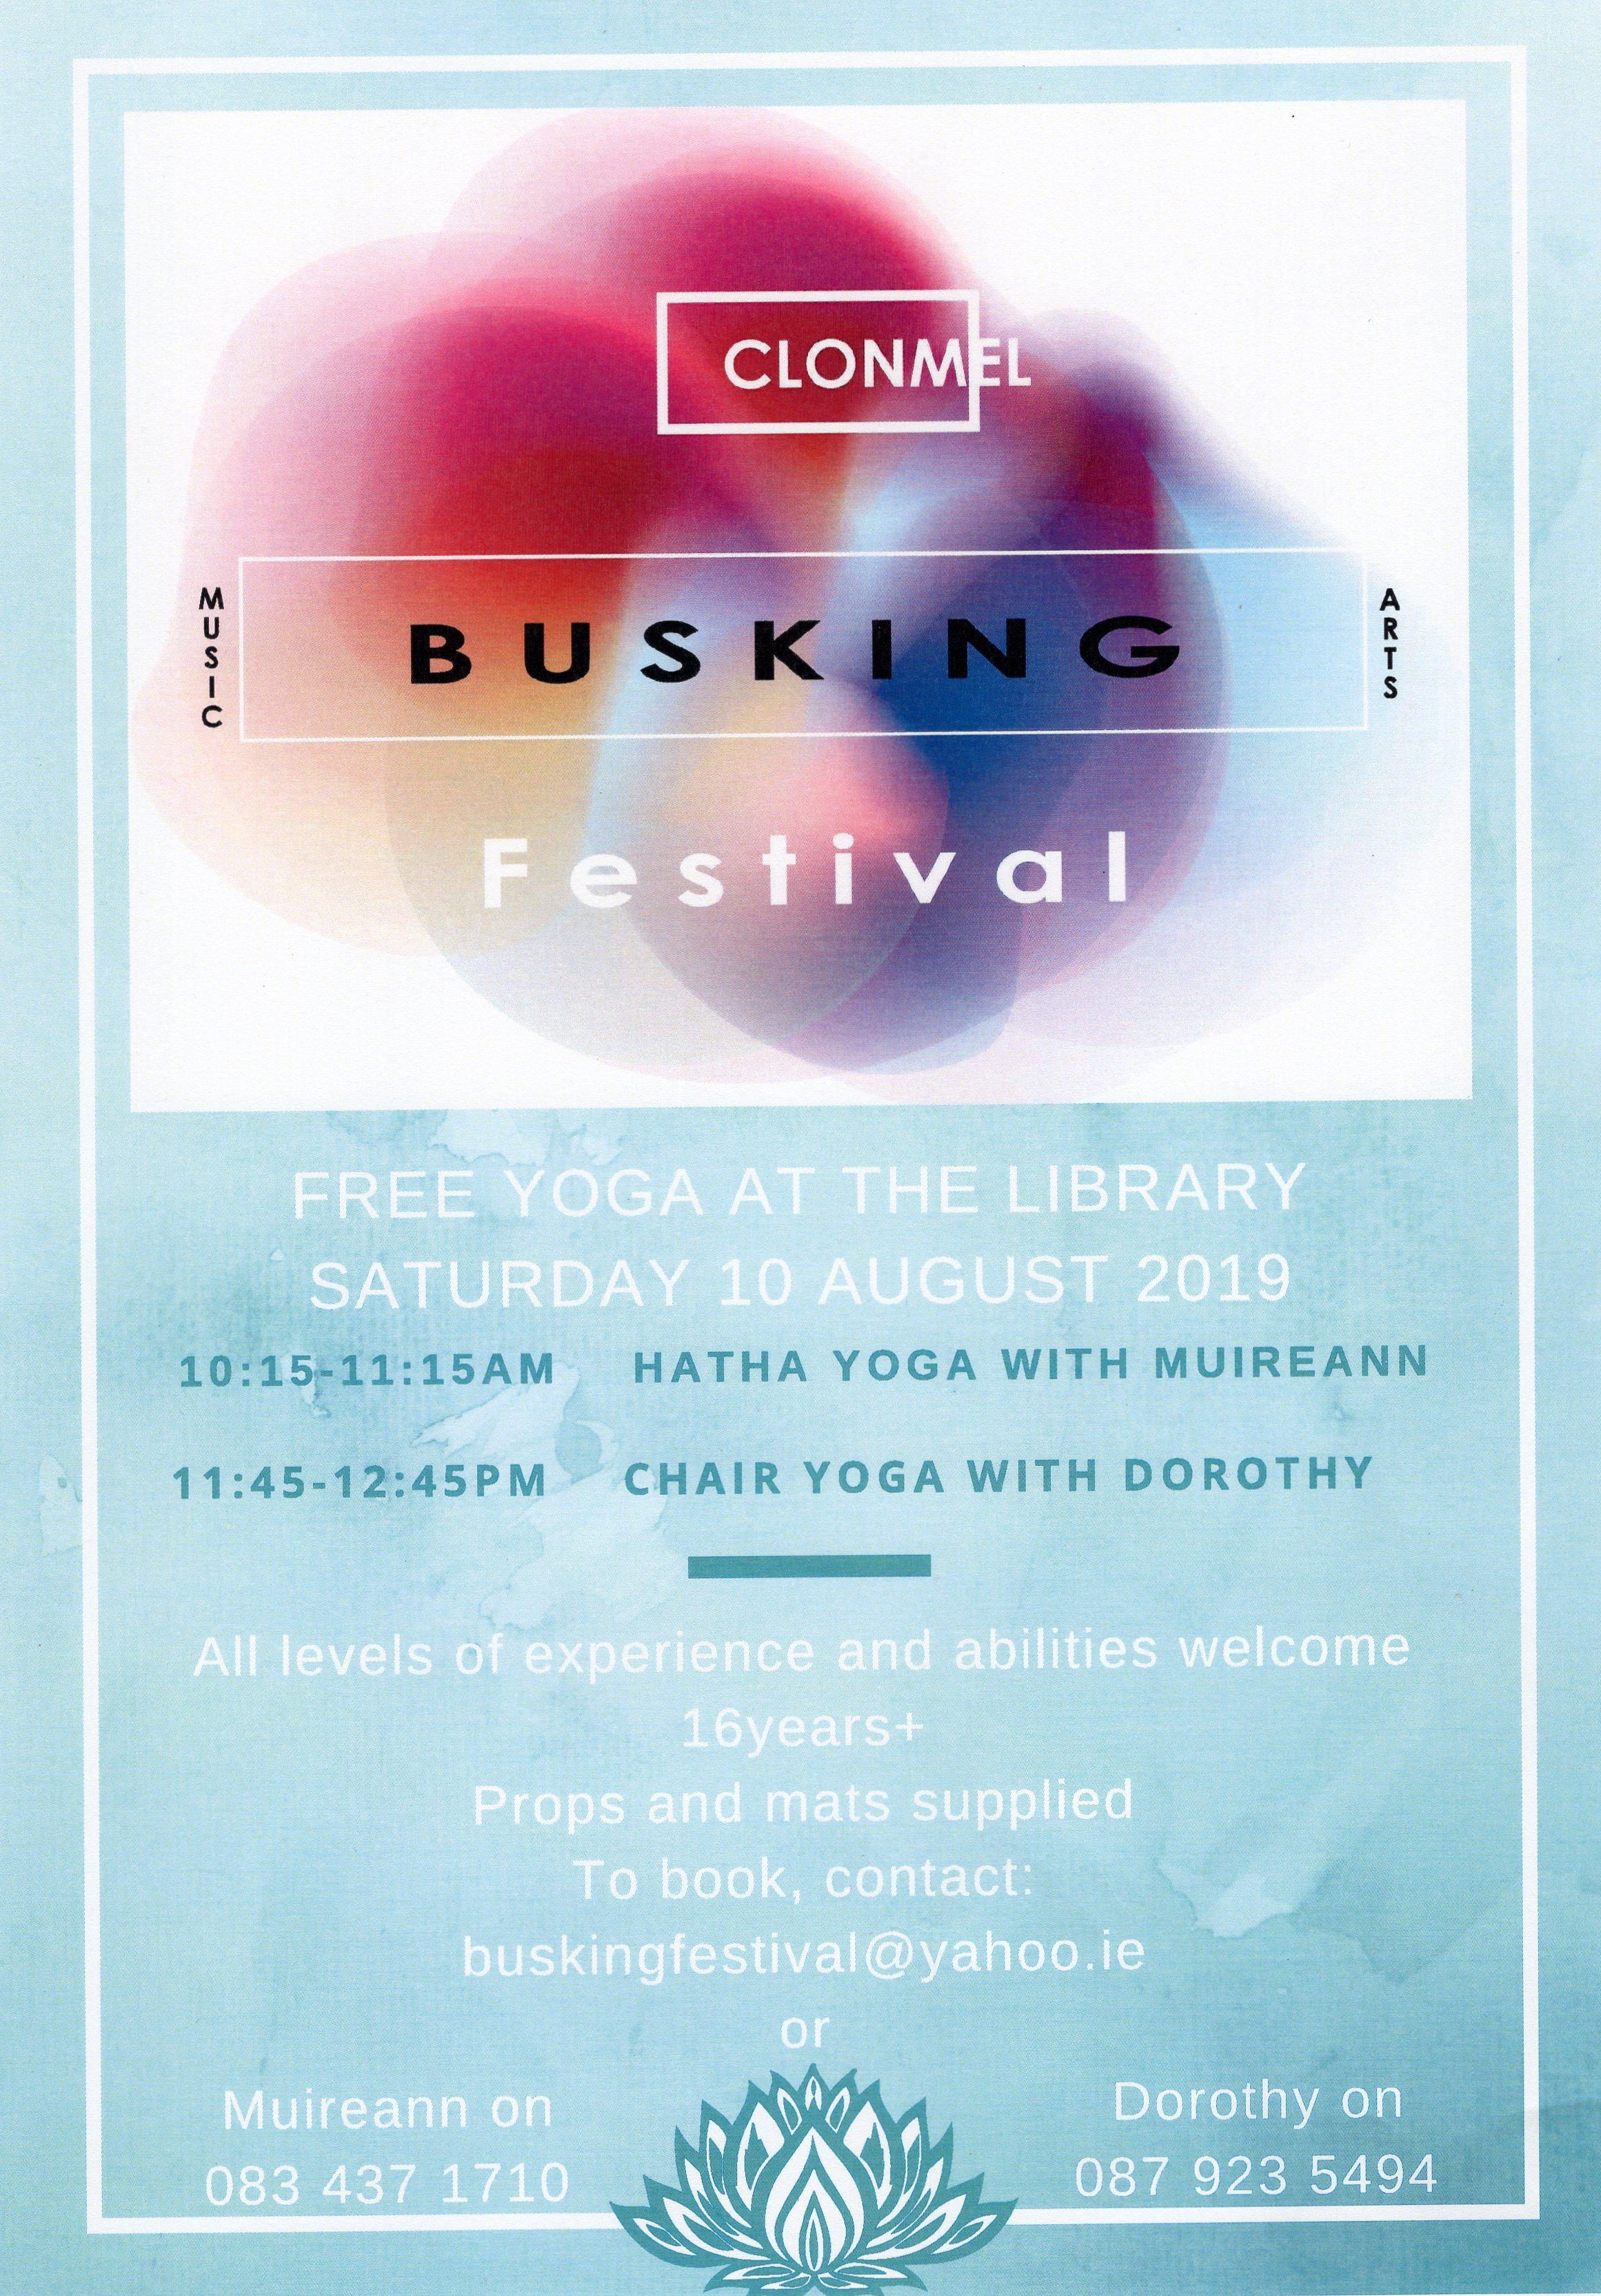 Free Yoga at Clonmel Library